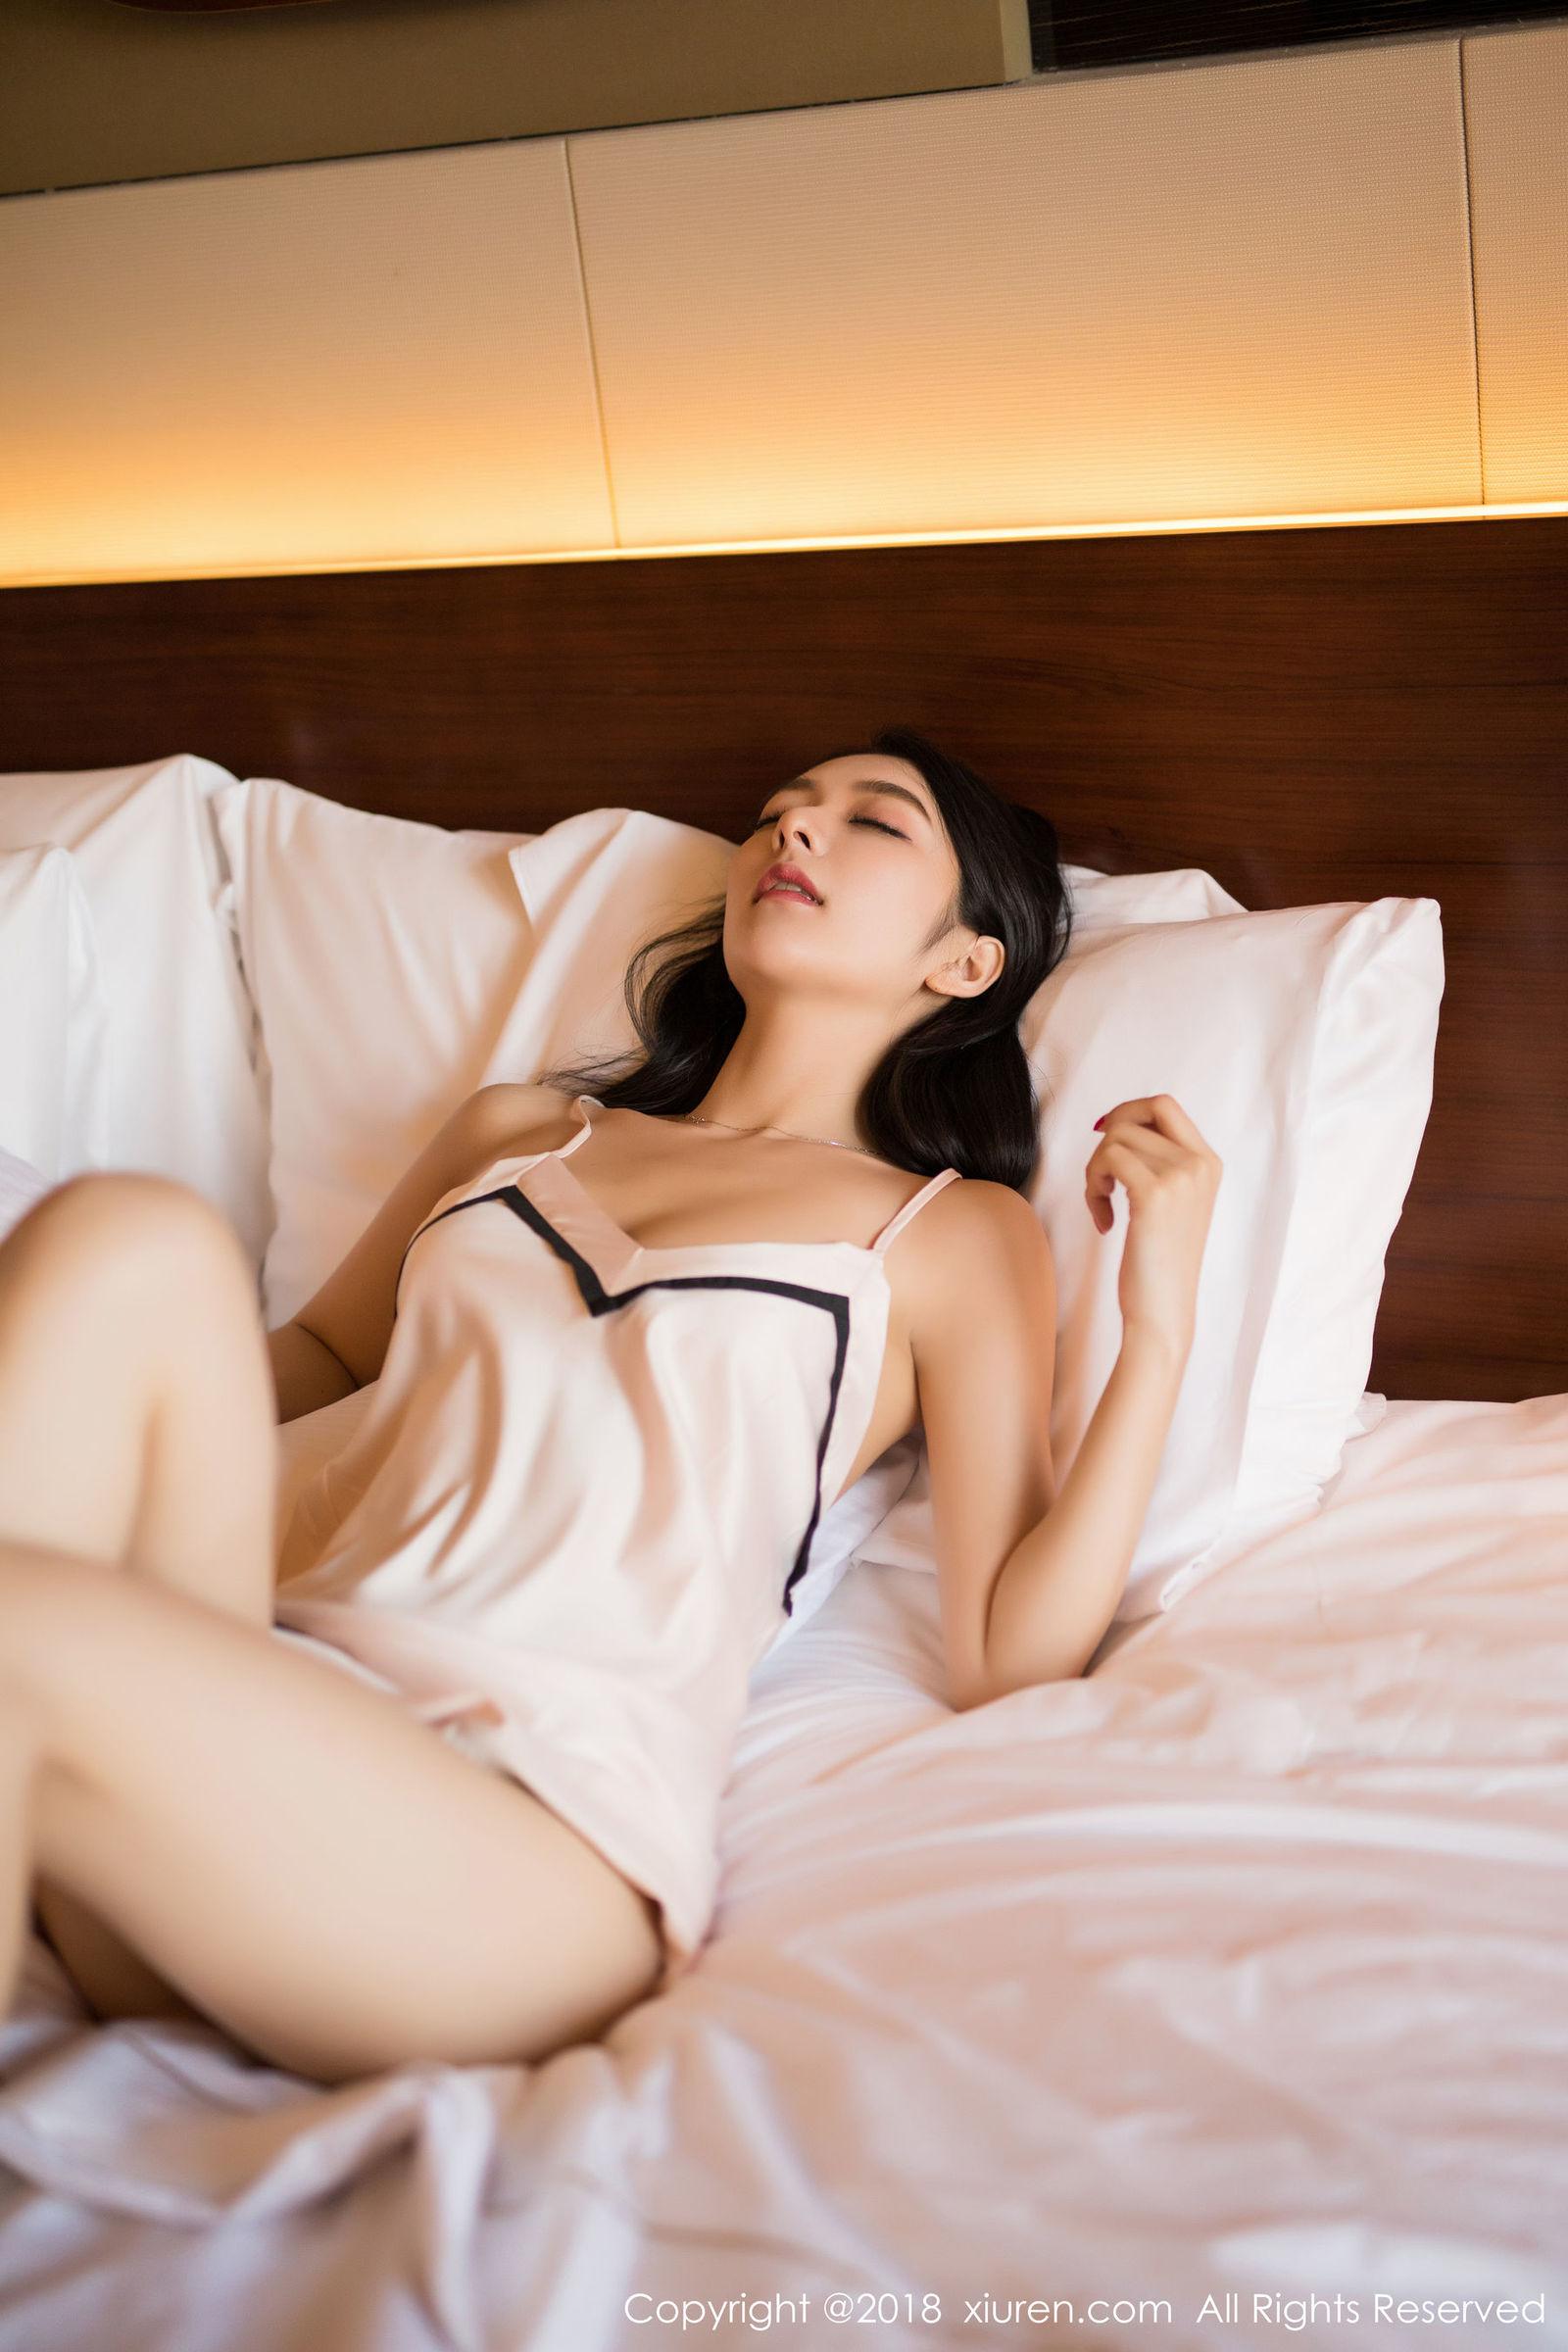 [XiuRen秀人] No.1292 女神@Angela喜欢猫 - 性感睡衣私房写真